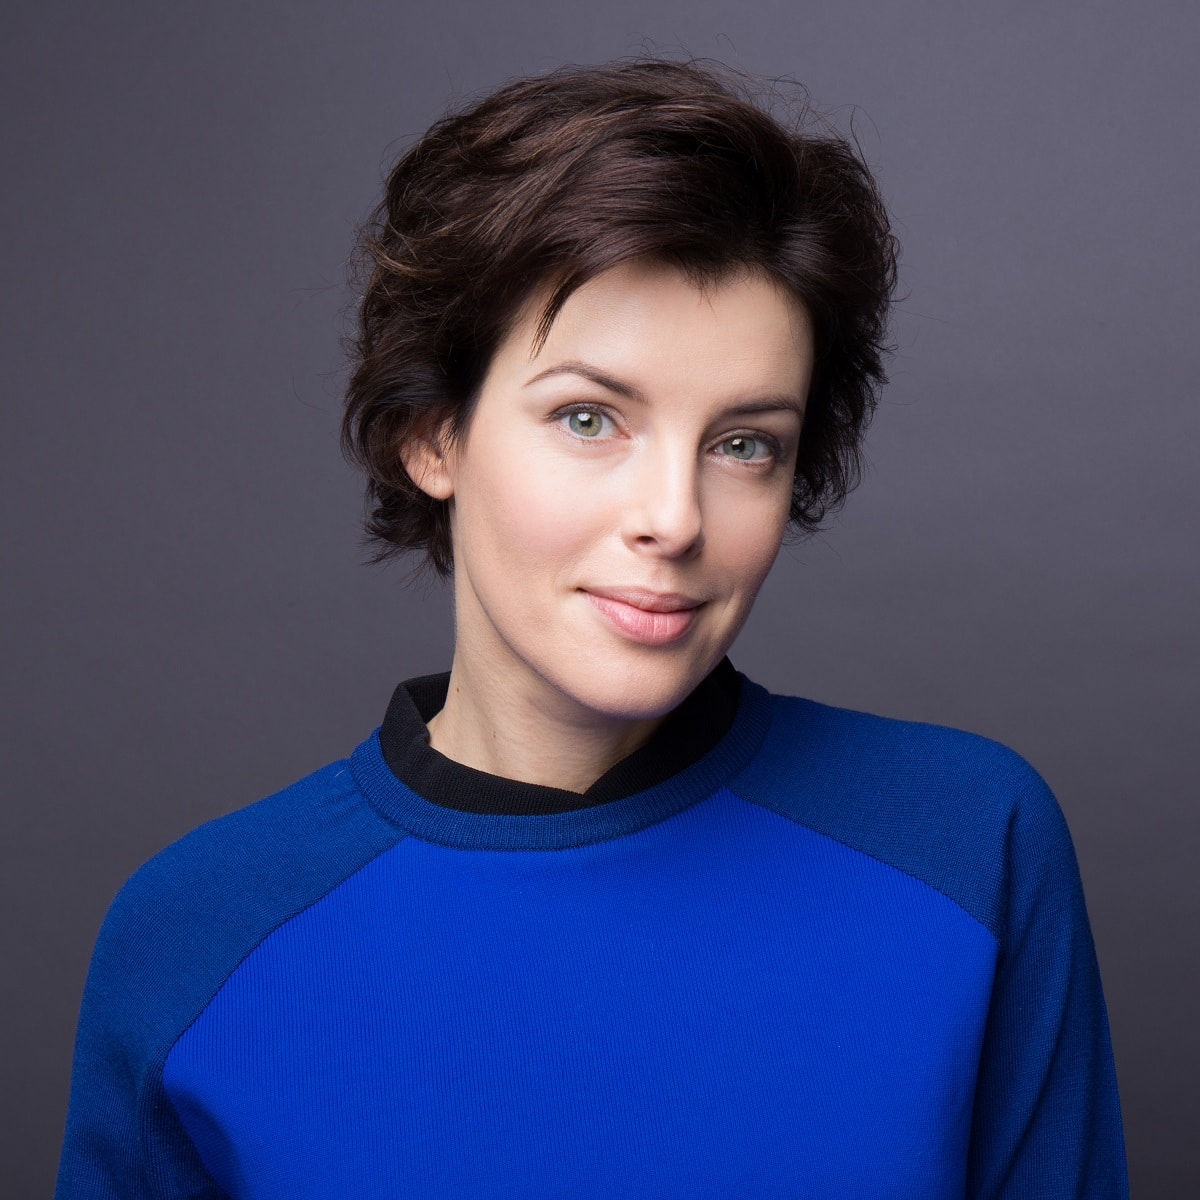 Мария Сёмкина фото плейбой